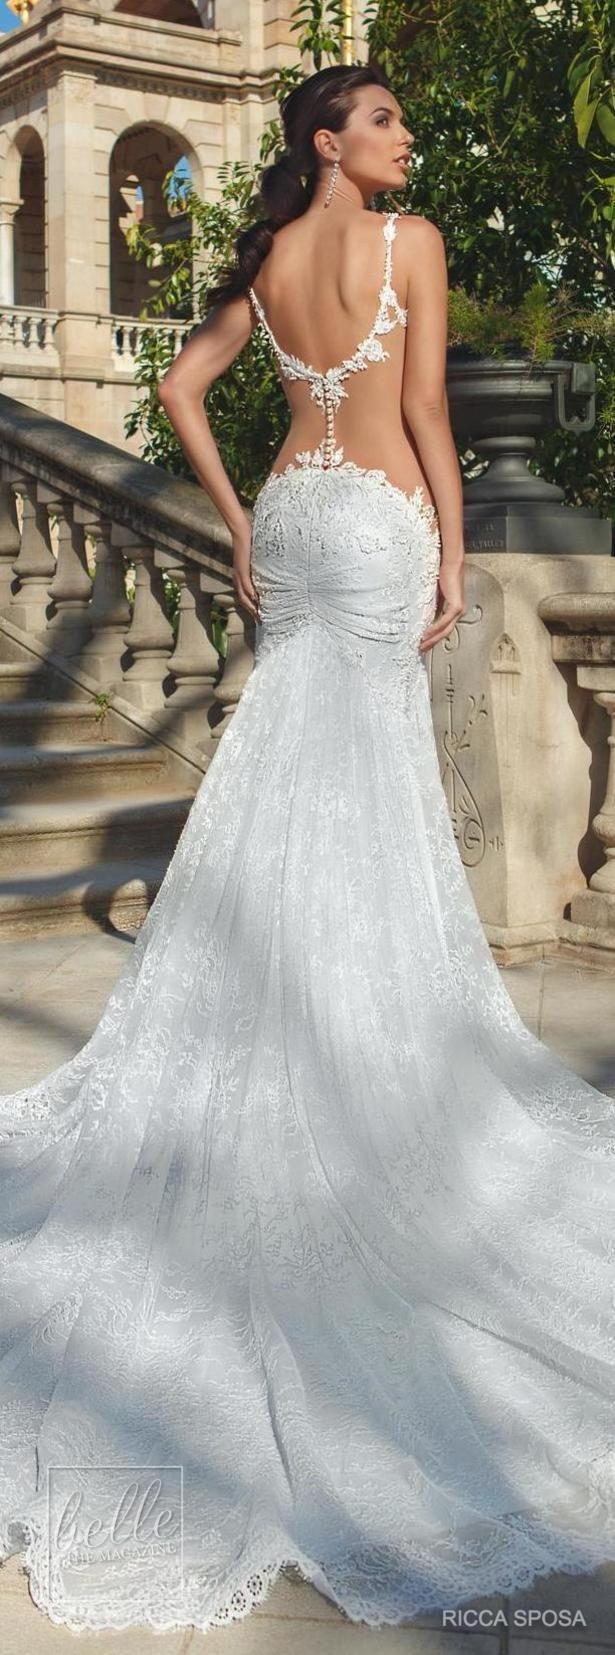 624 best WHITE LADY NUGRED❤ ❤ images on Pinterest | Wedding ...